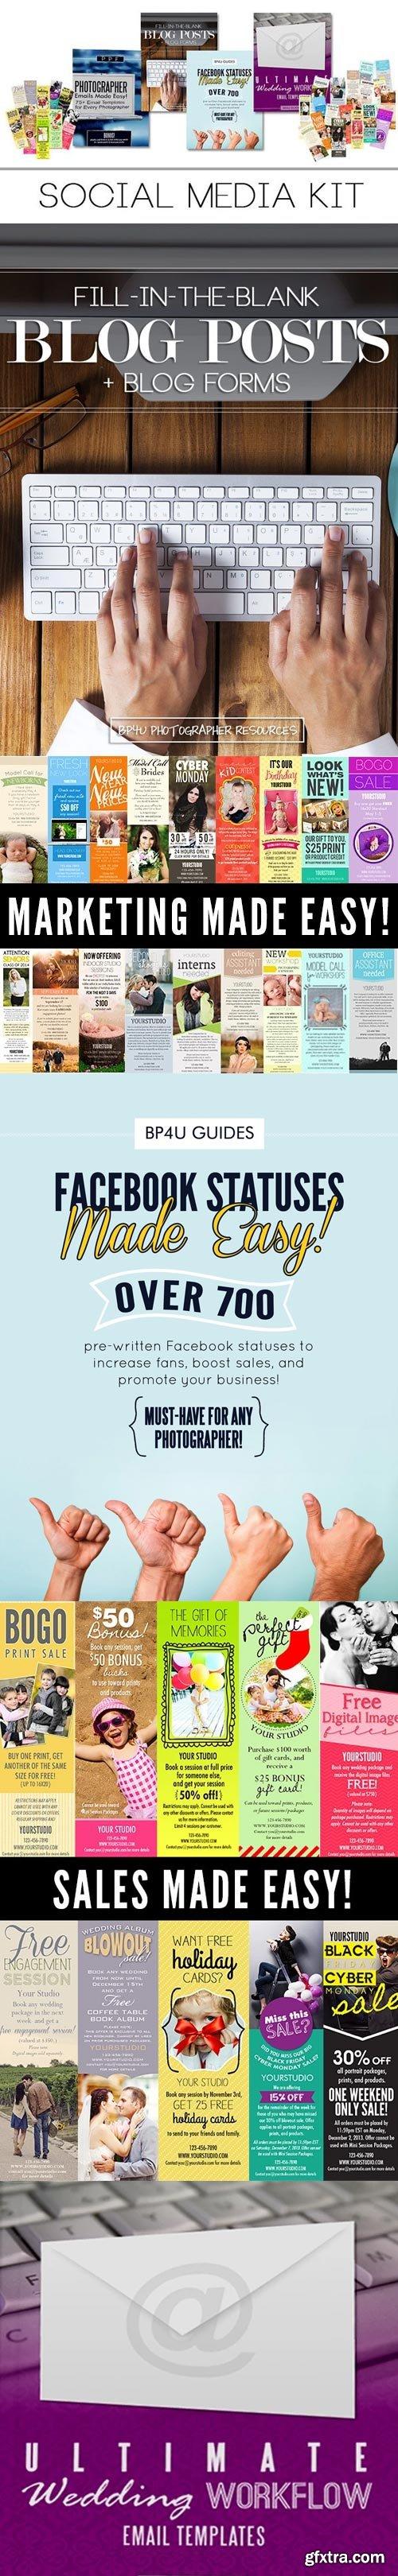 Photographer Resources - Social Media Kit